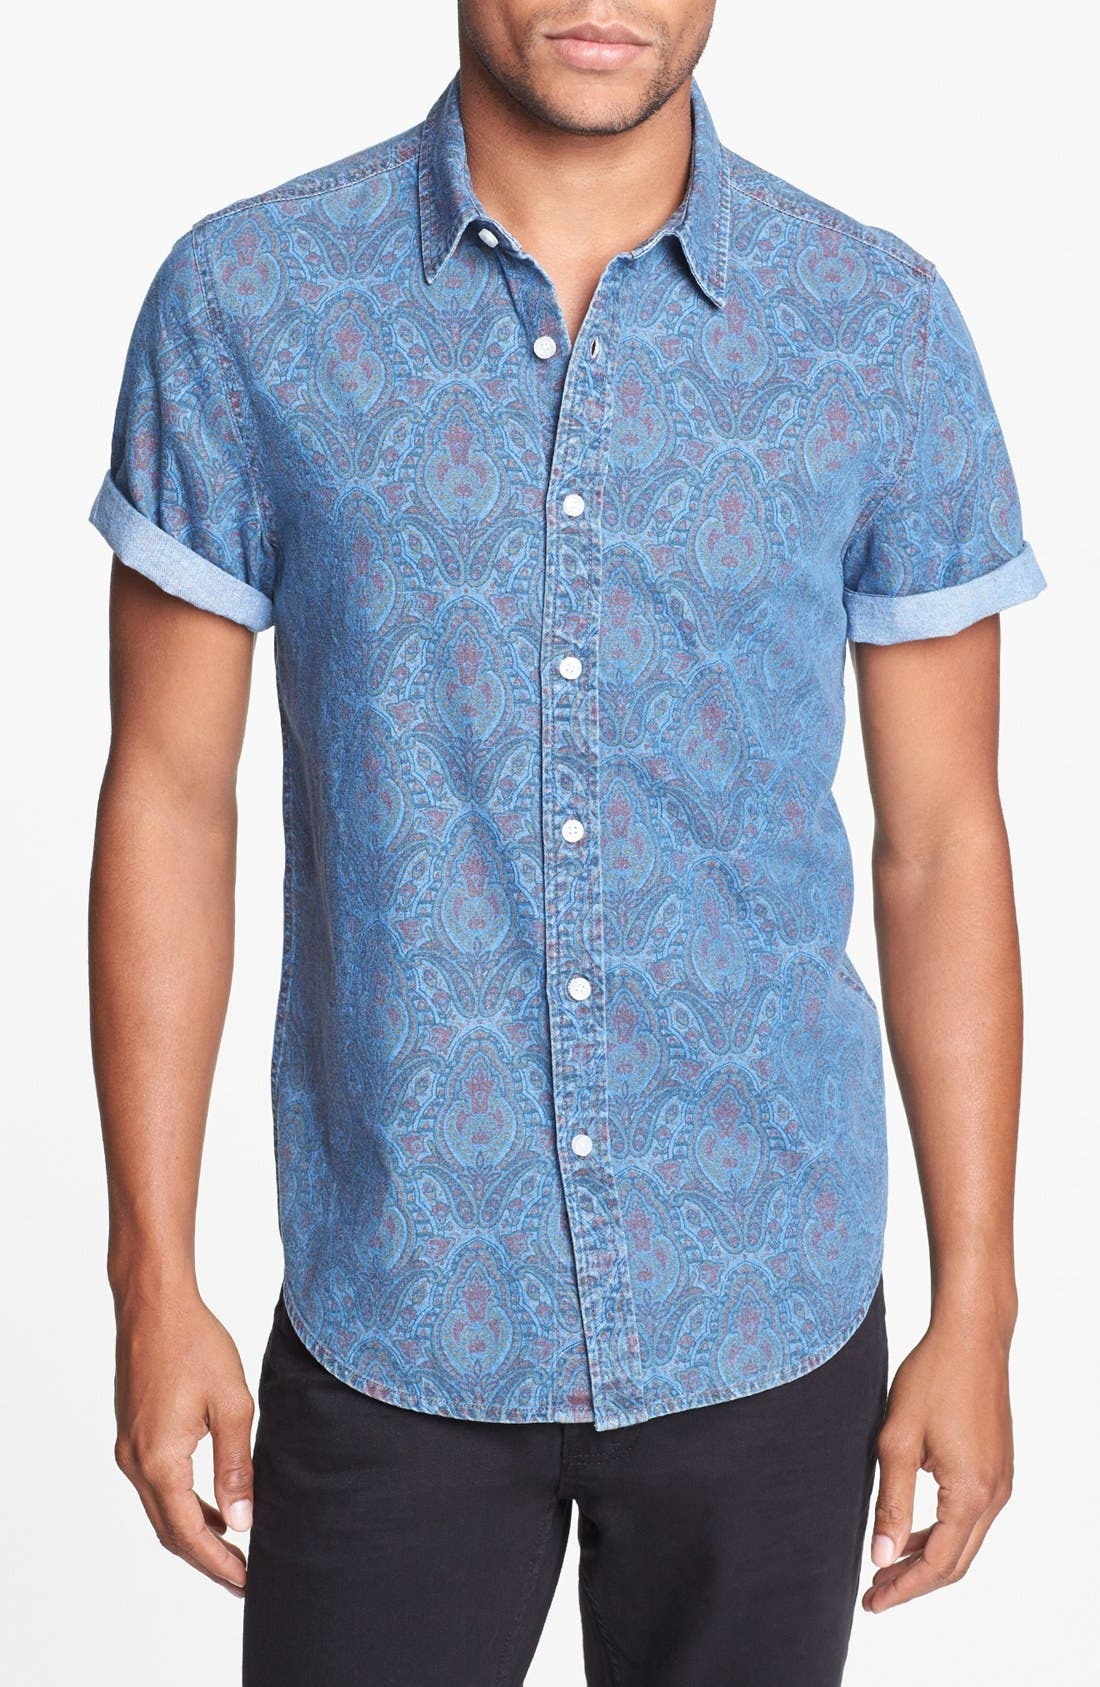 Alternate Image 1 Selected - Topman Short Sleeve Paisley Print Shirt